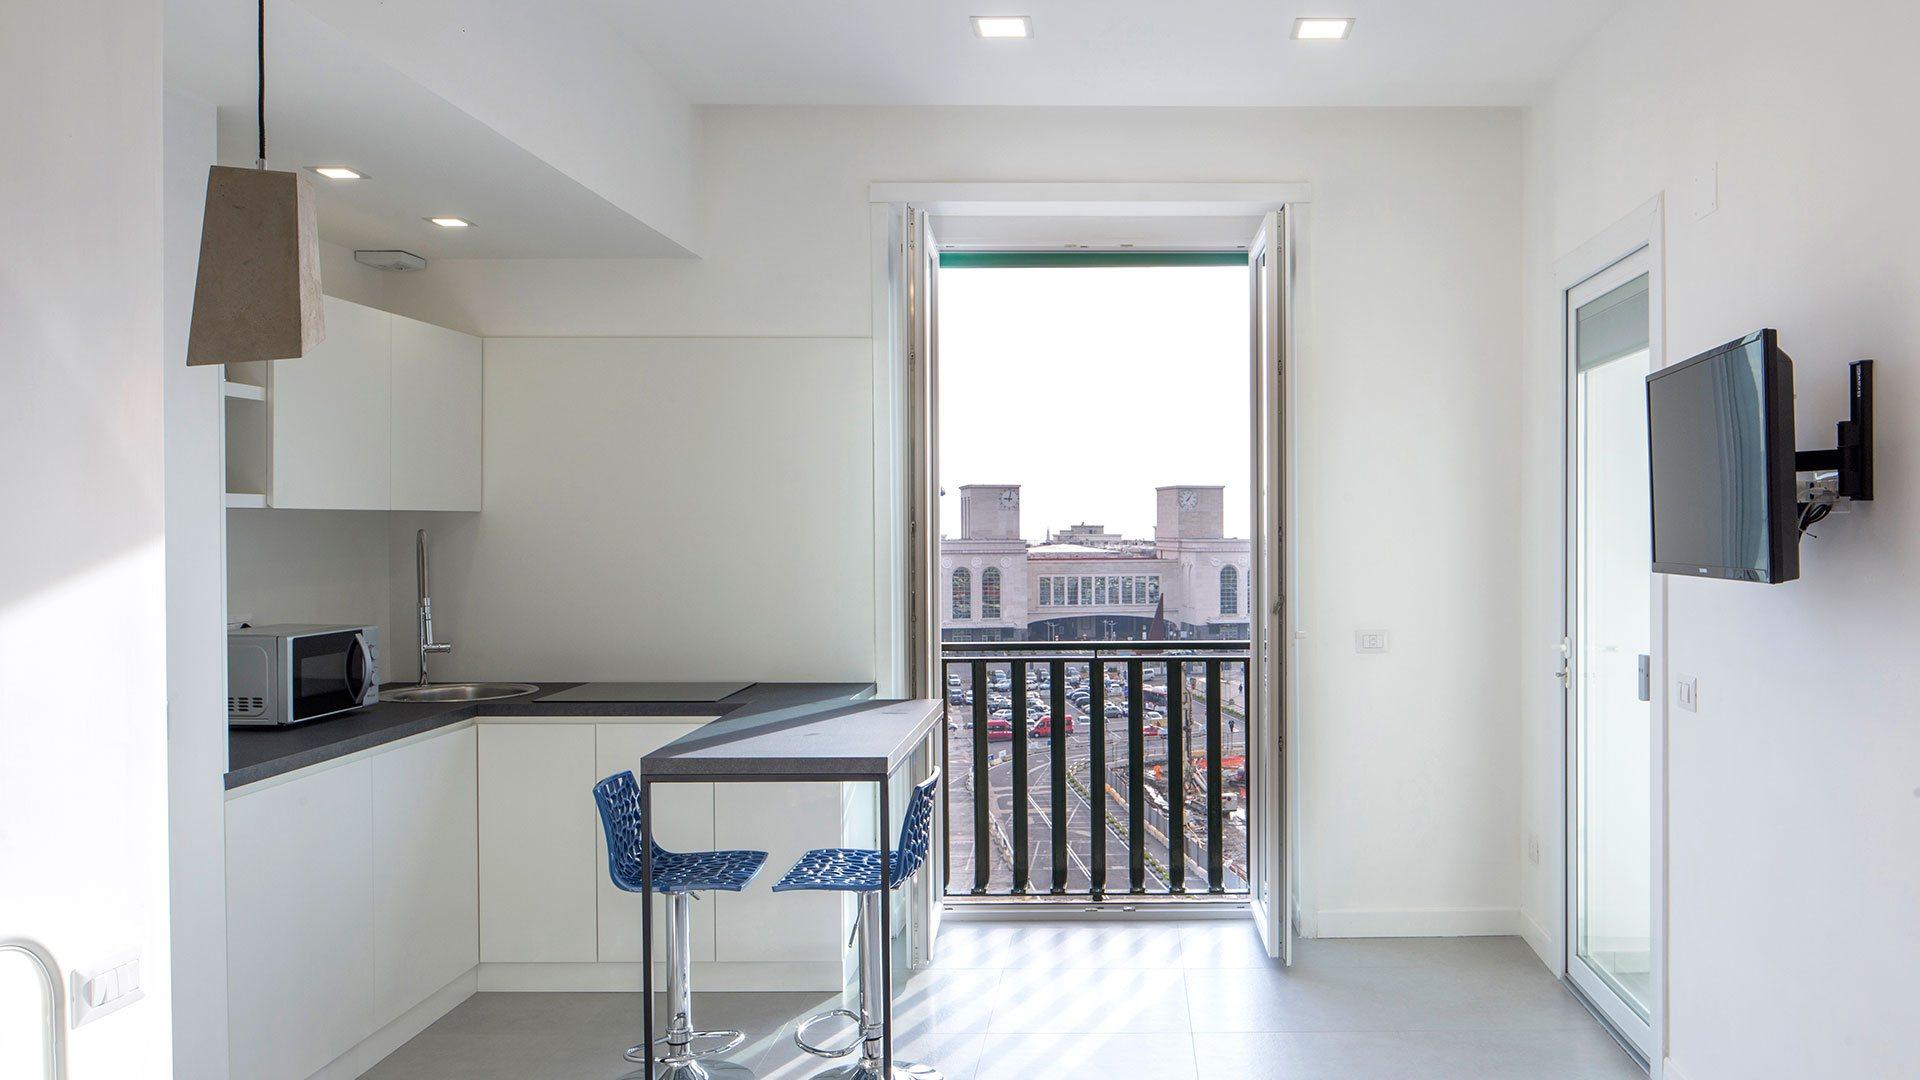 Naples Studio Apartment holyday business Napoli appartamenti